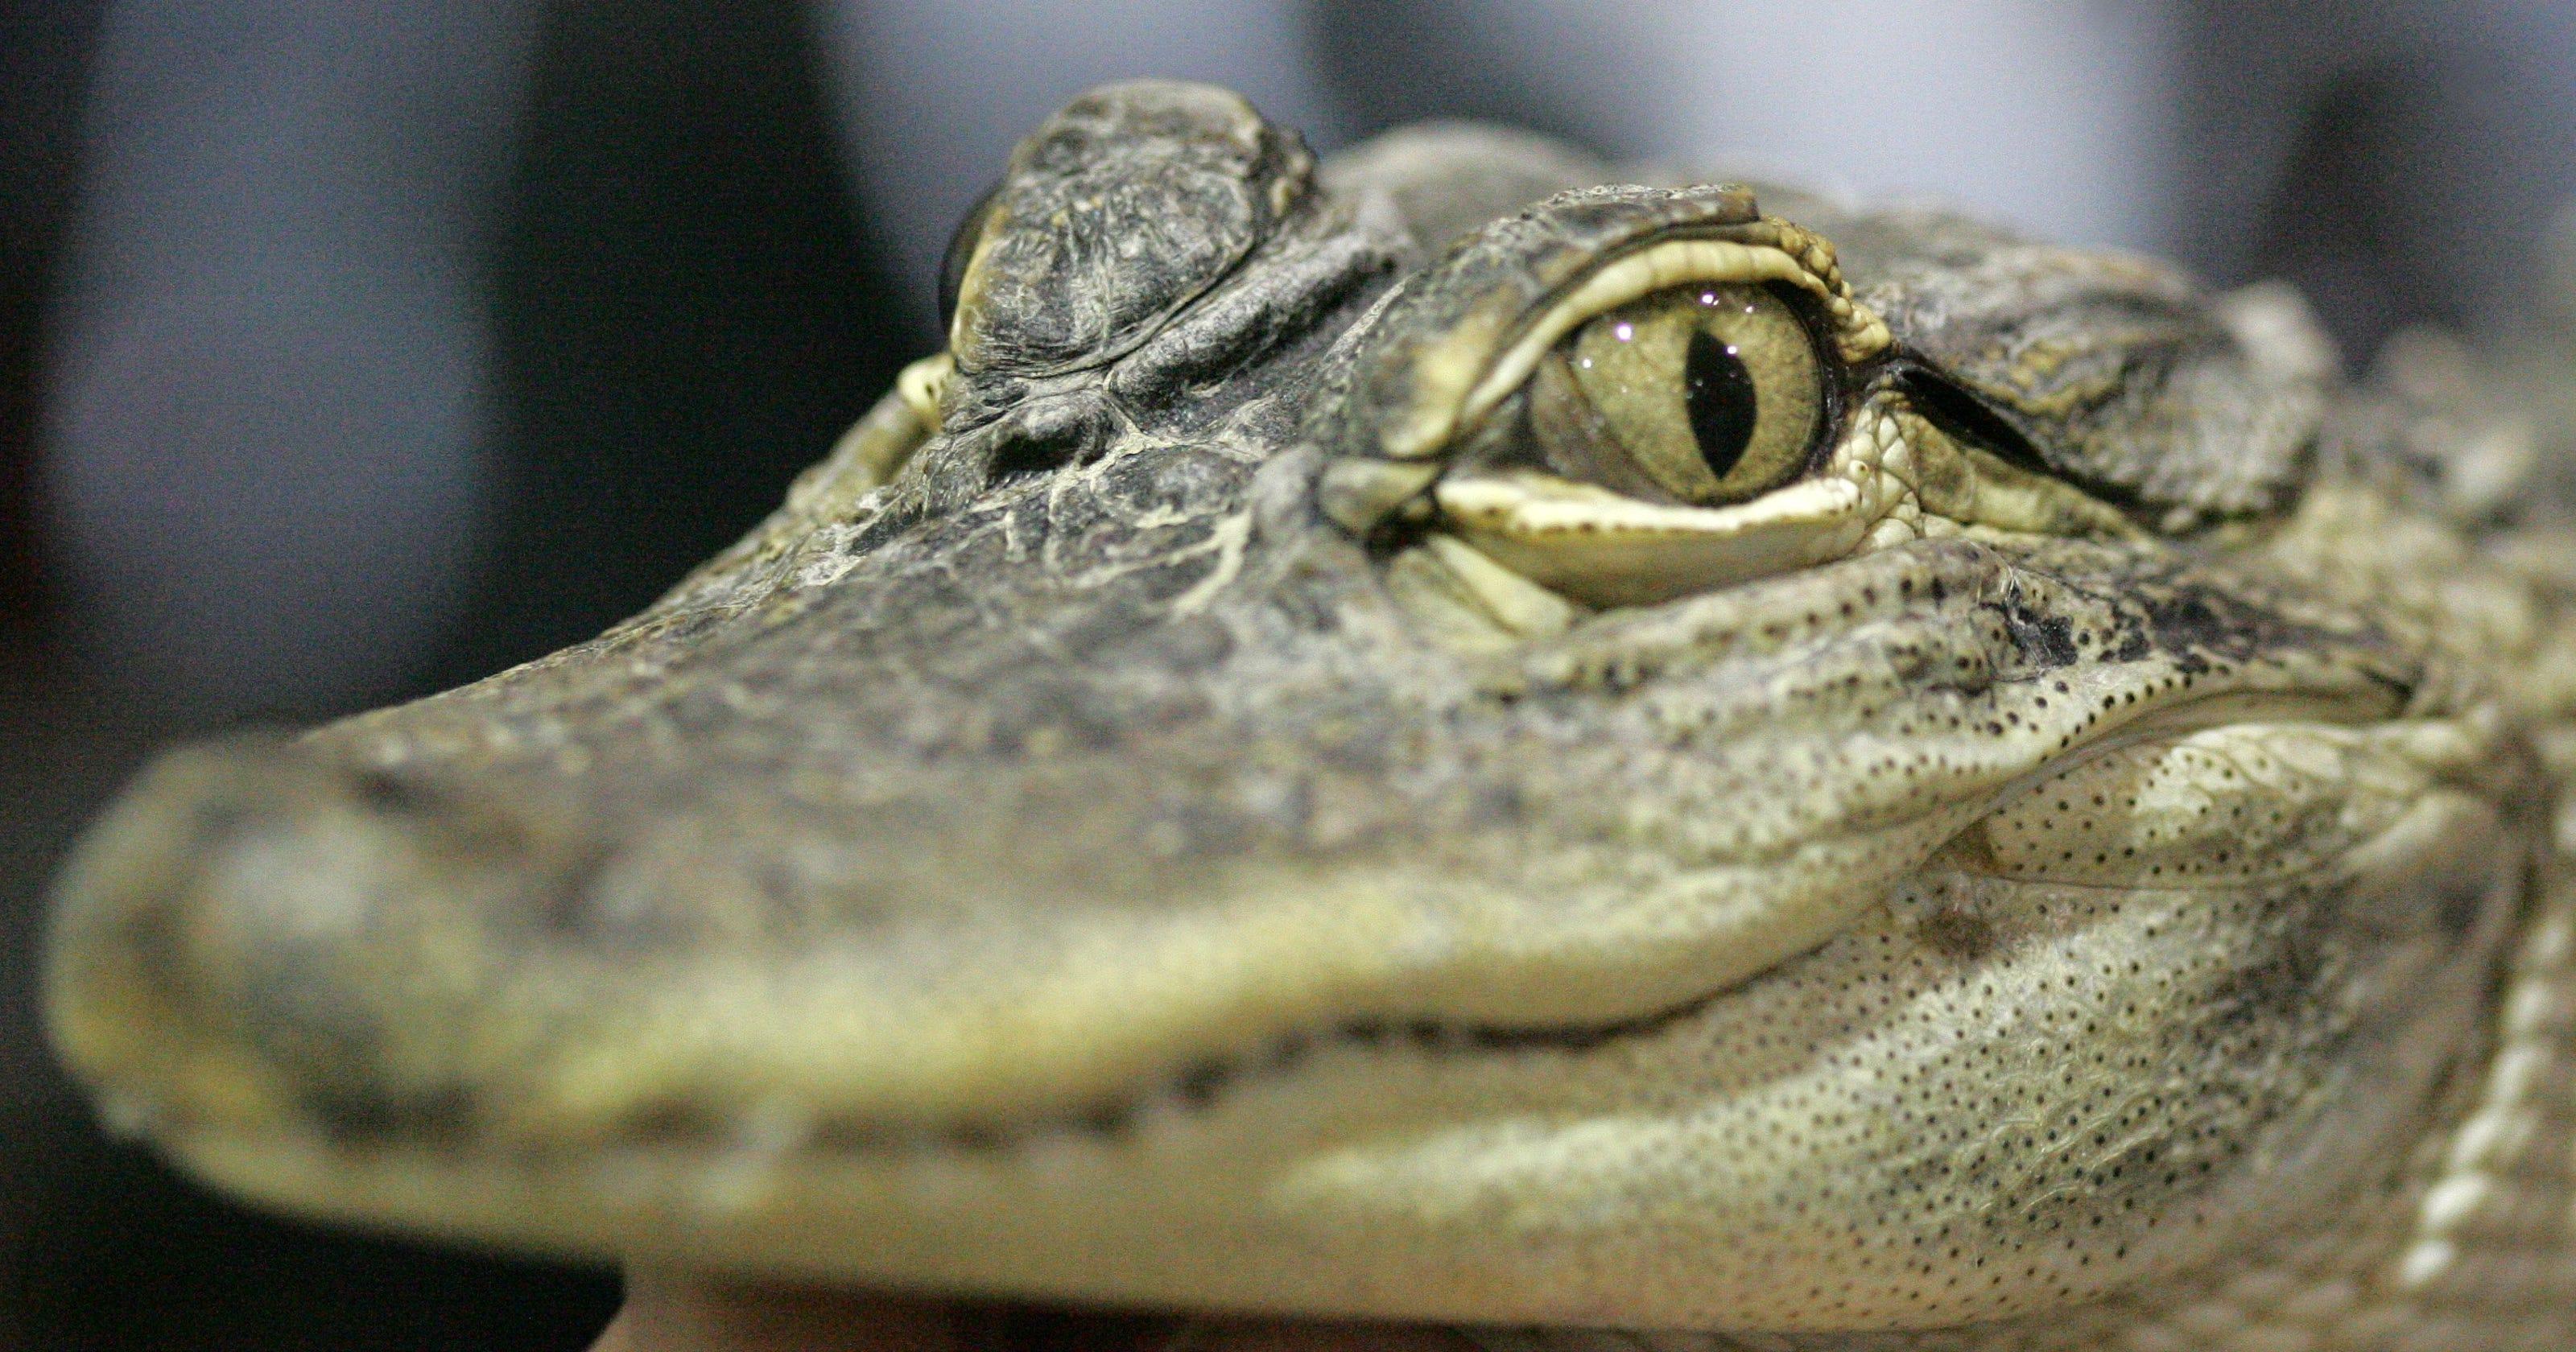 Florida man accused of tossing gator at drive-thru